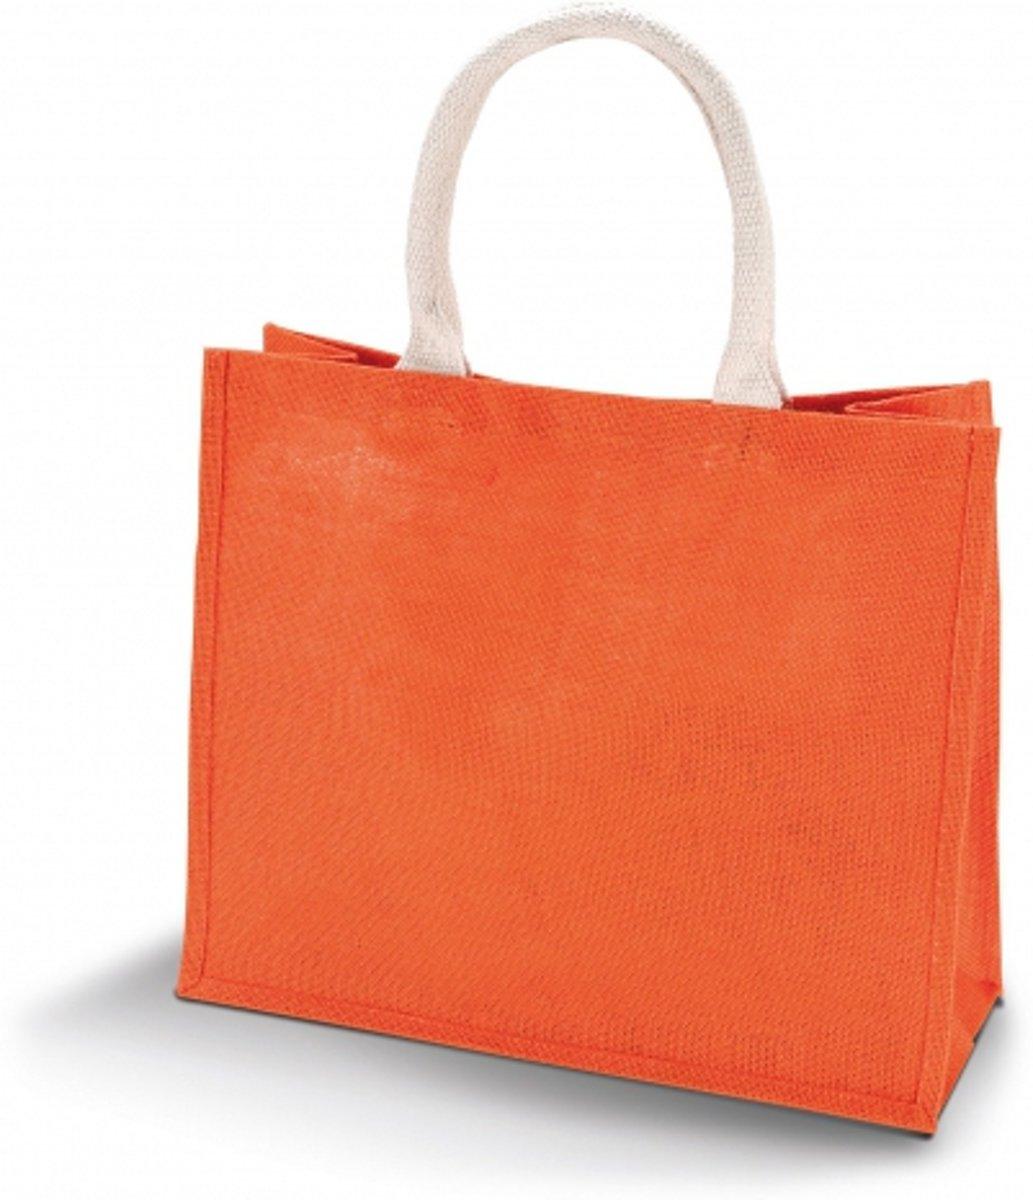 c38062c3b85 bol.com   Oranje Tas kopen? Alle Oranje Tassen online